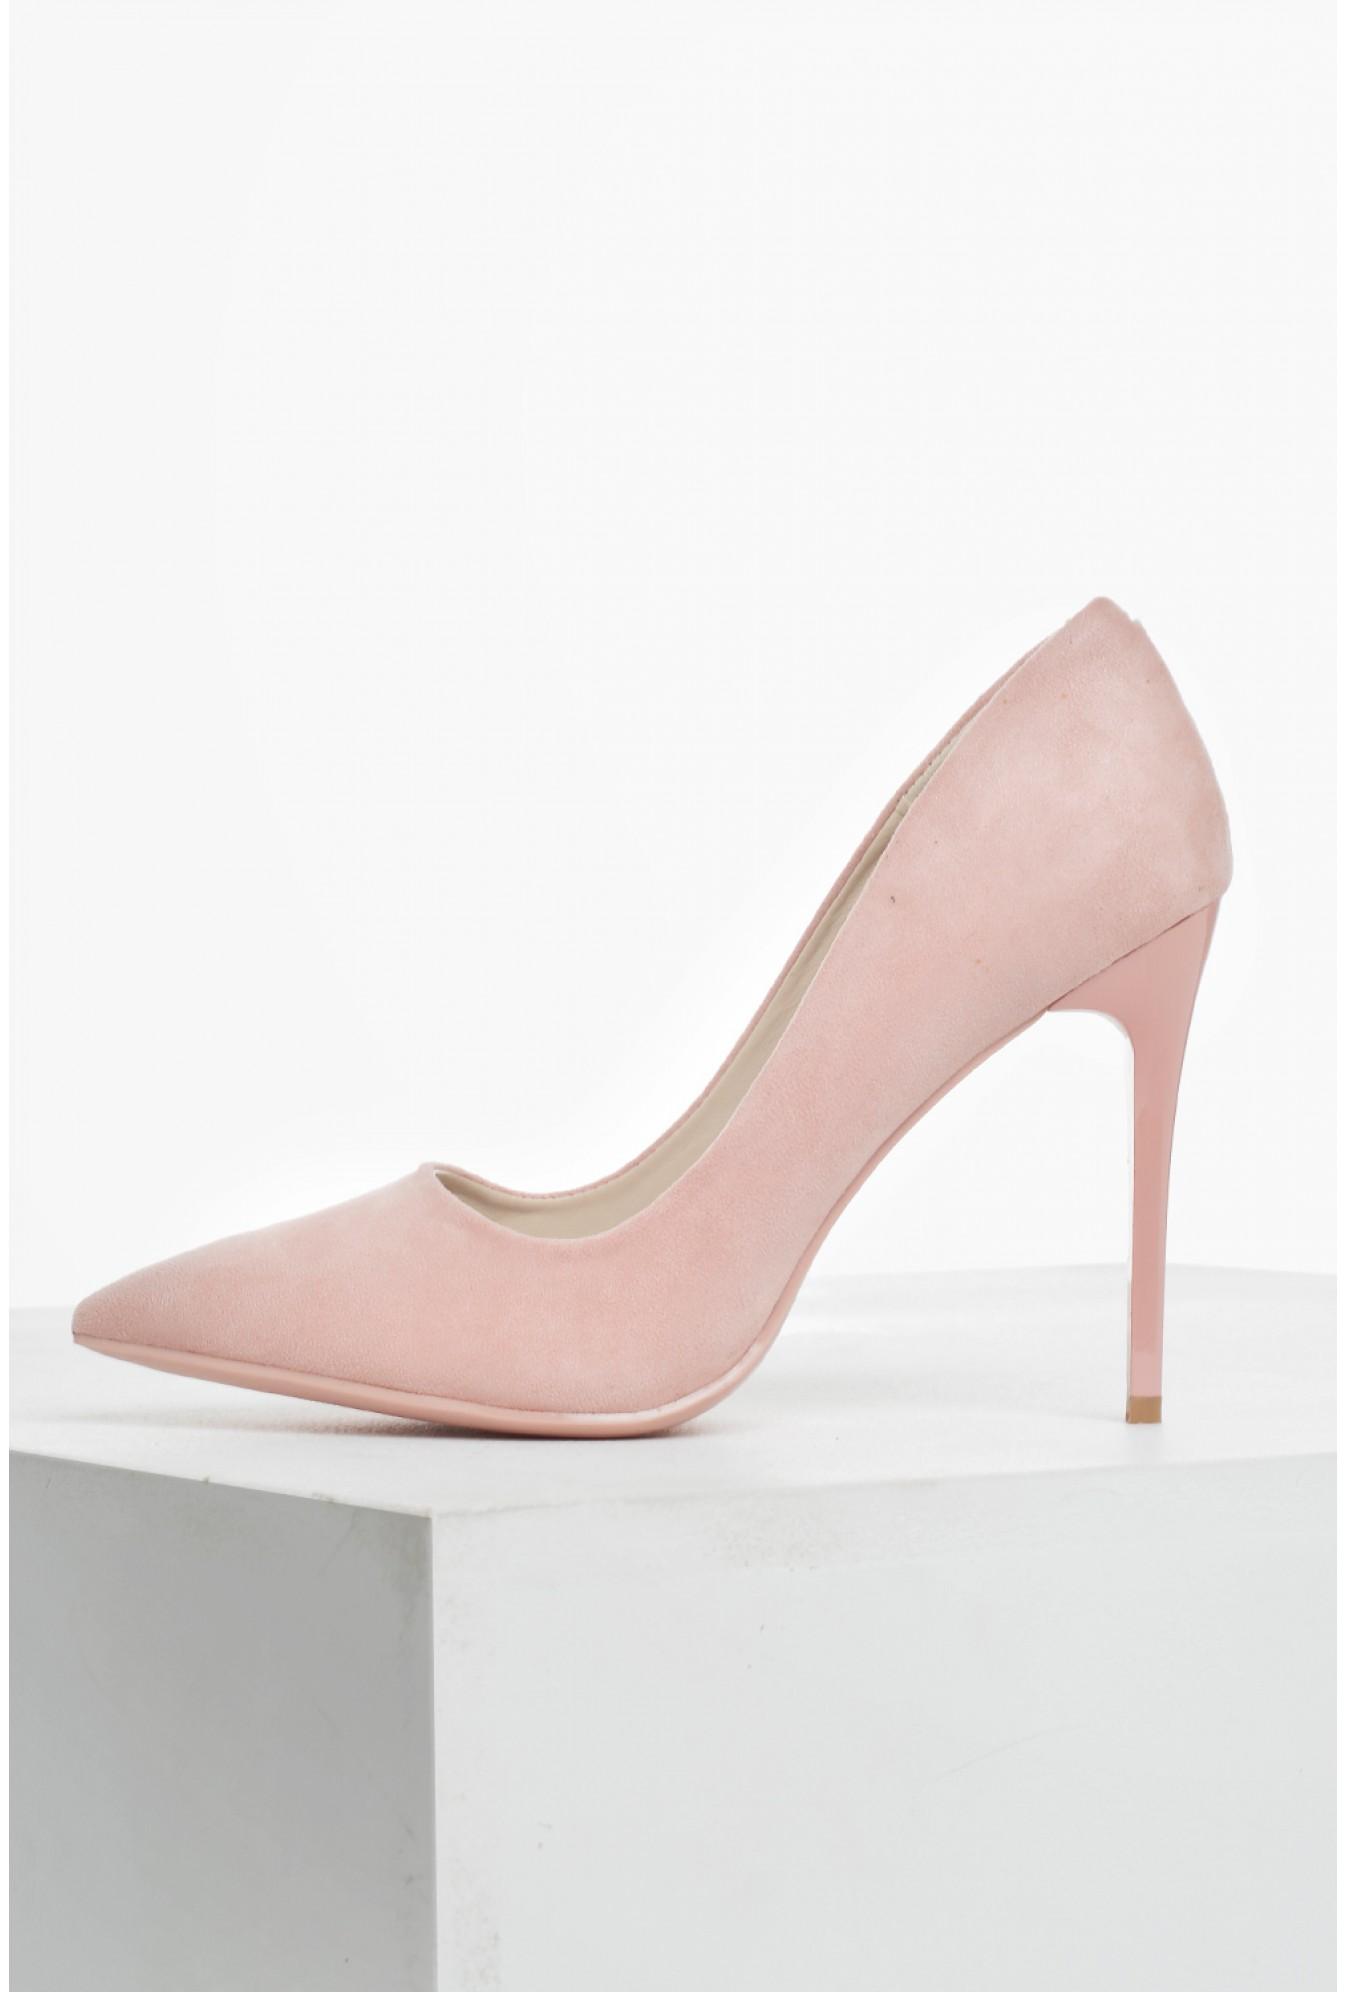 C'M Paris Sarah Suede Court Shoes in